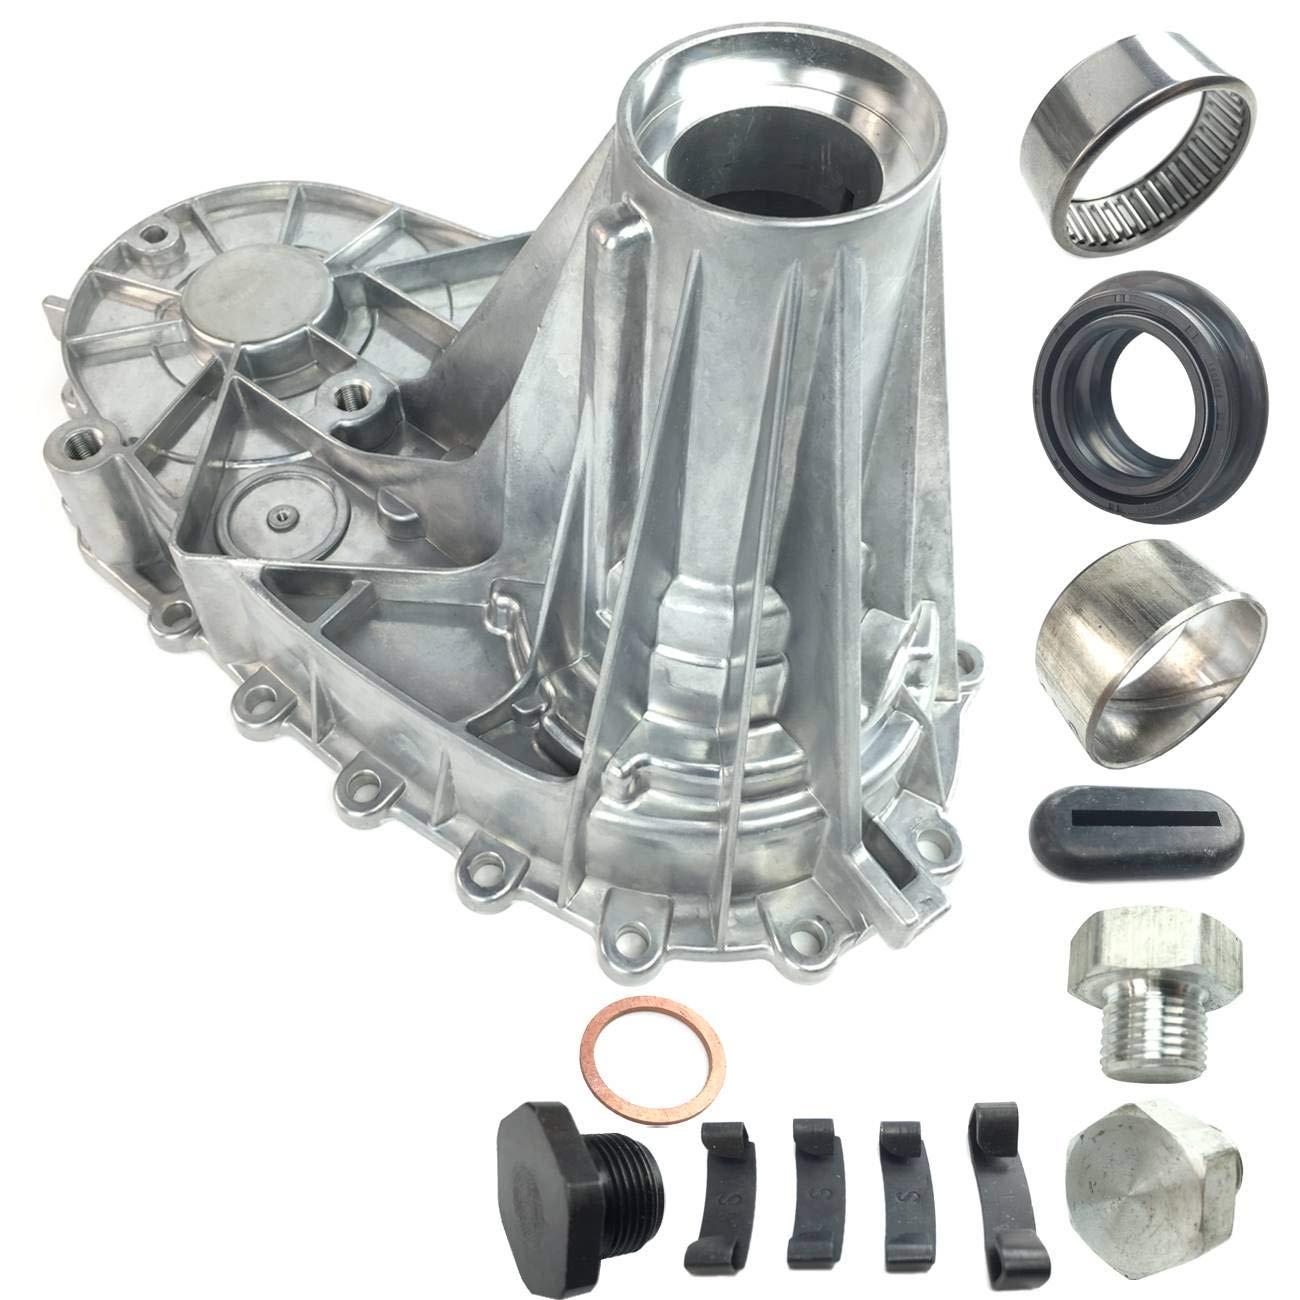 Bapmic 12474949 Rear Transfer Case Rear Housing Repair Kit for Cadillac Chevrolet GMC Silverado Suburban Avalanche